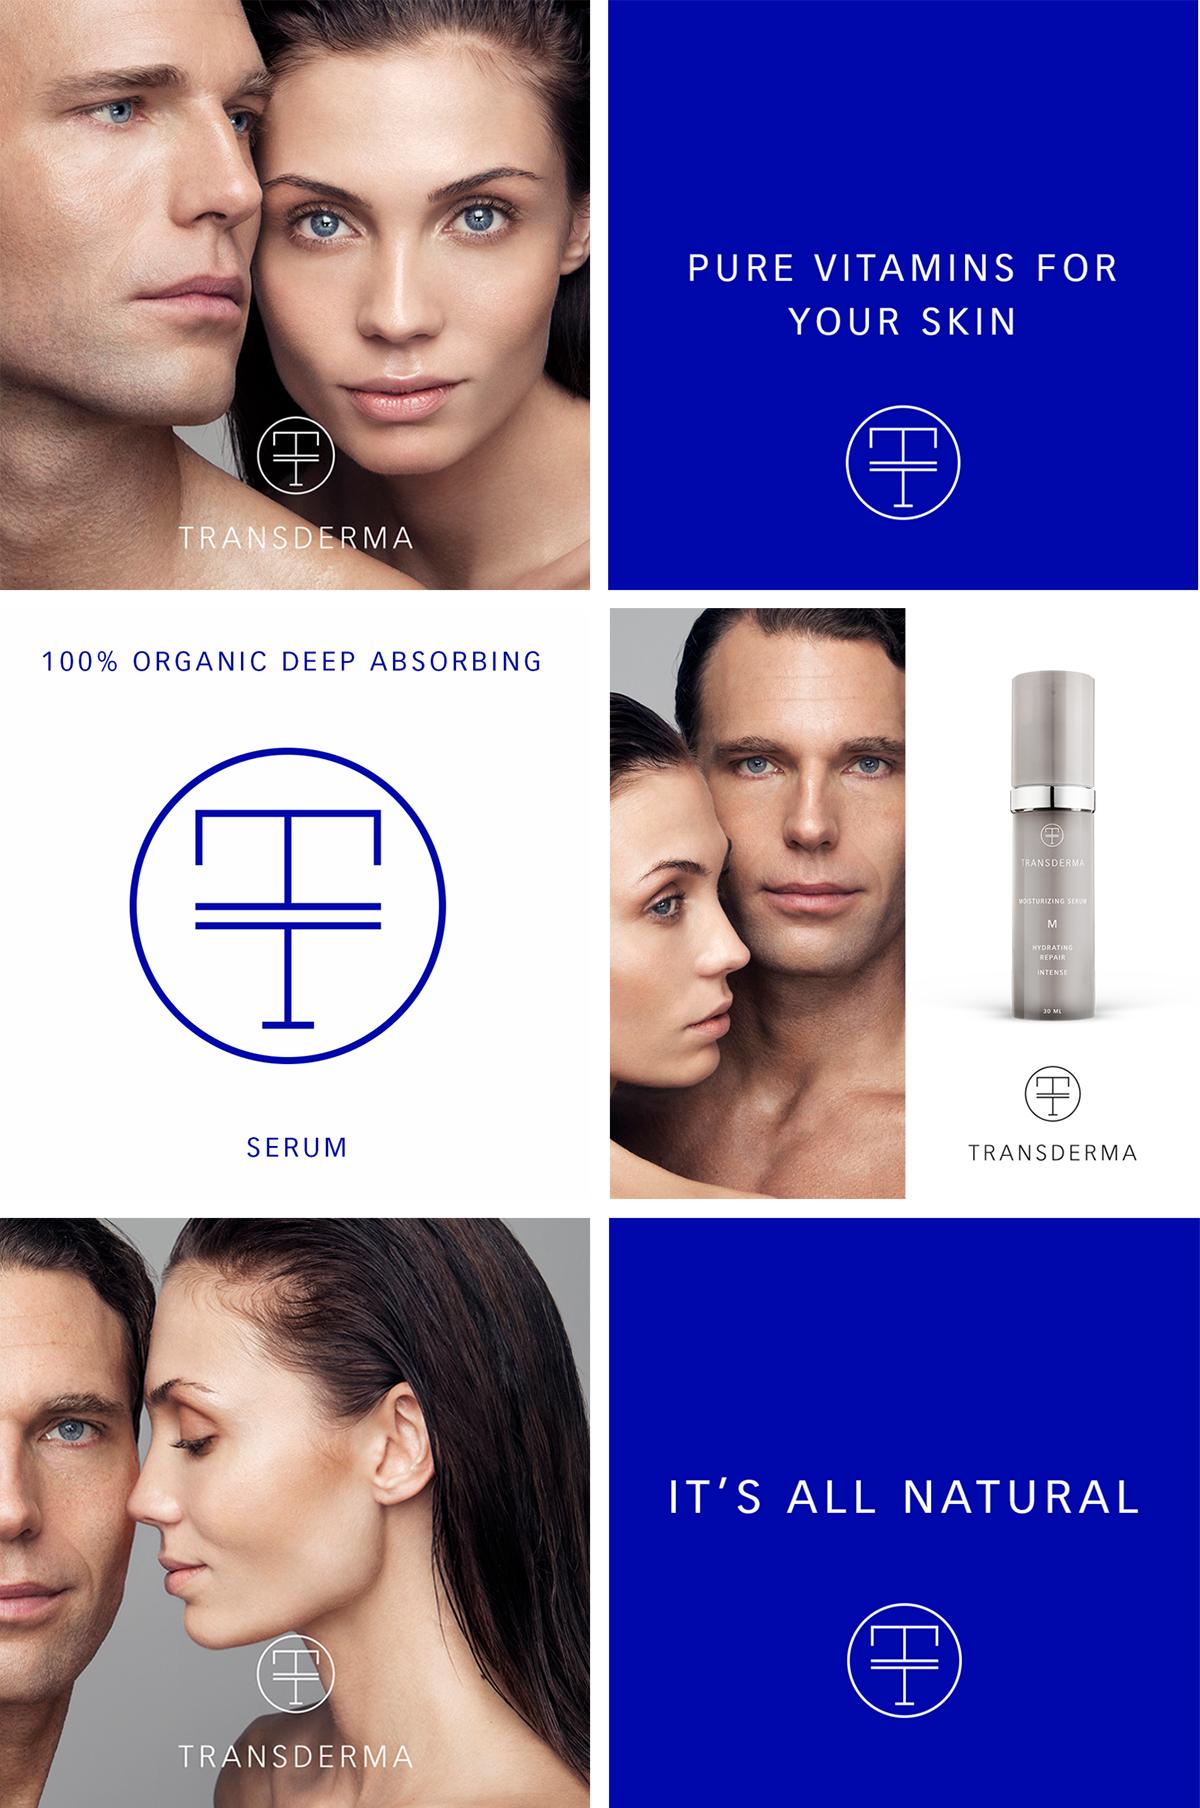 identity design skin care Stockholm Sweden photo beauty bottle cosmetics logo symbol Logotype typographic creative science